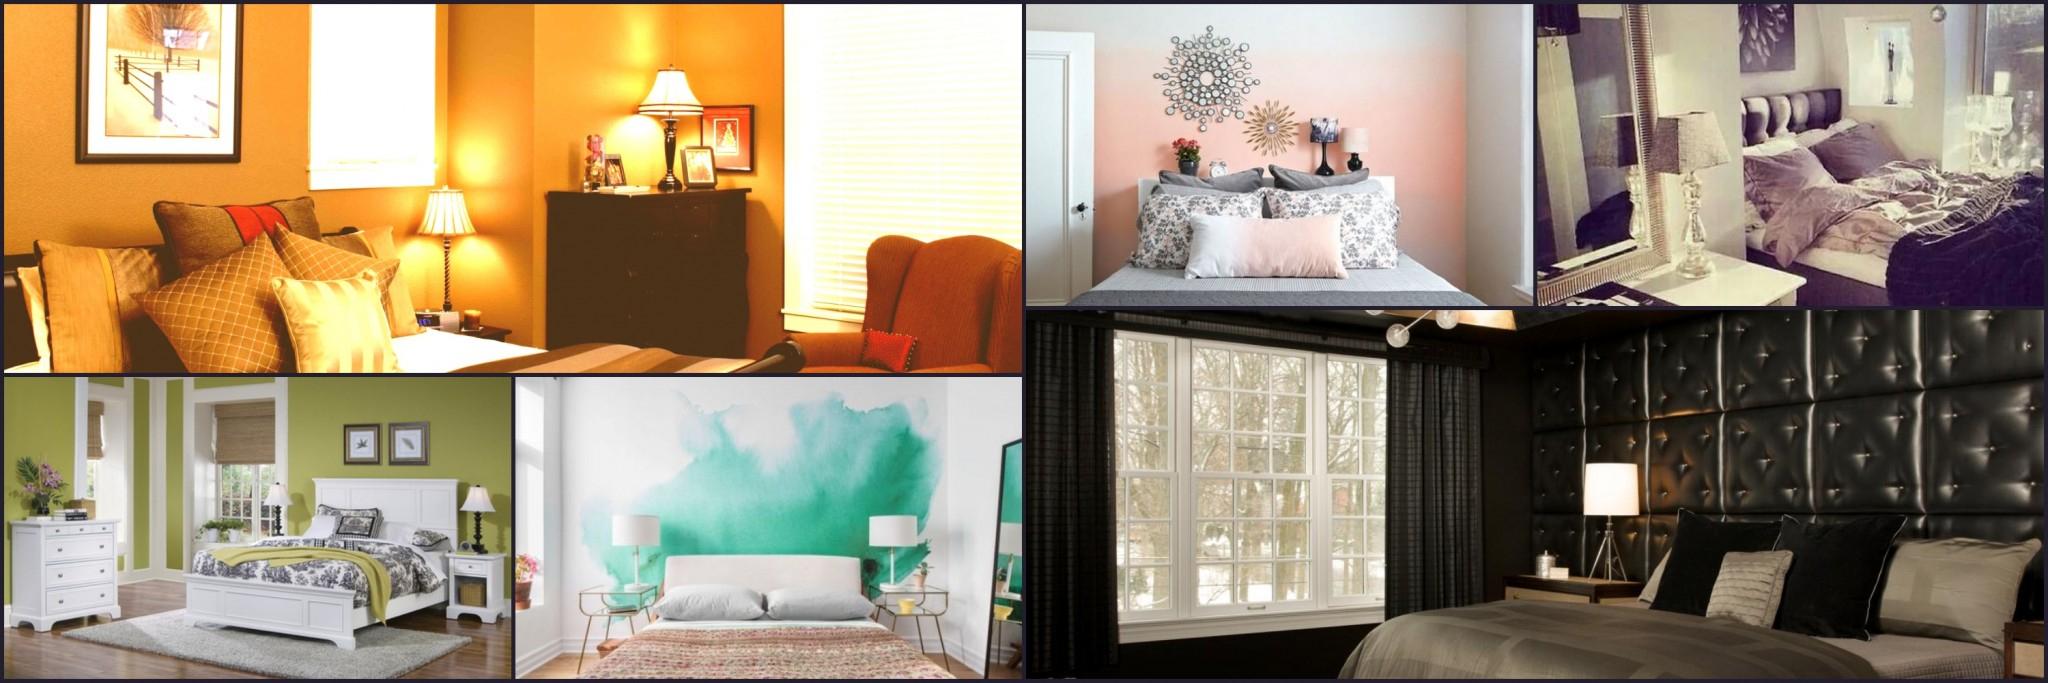 10 Unique Master Bedroom Wall Color Ideas 10 best master bedroom paint color ideas that will leave you awestruck 1